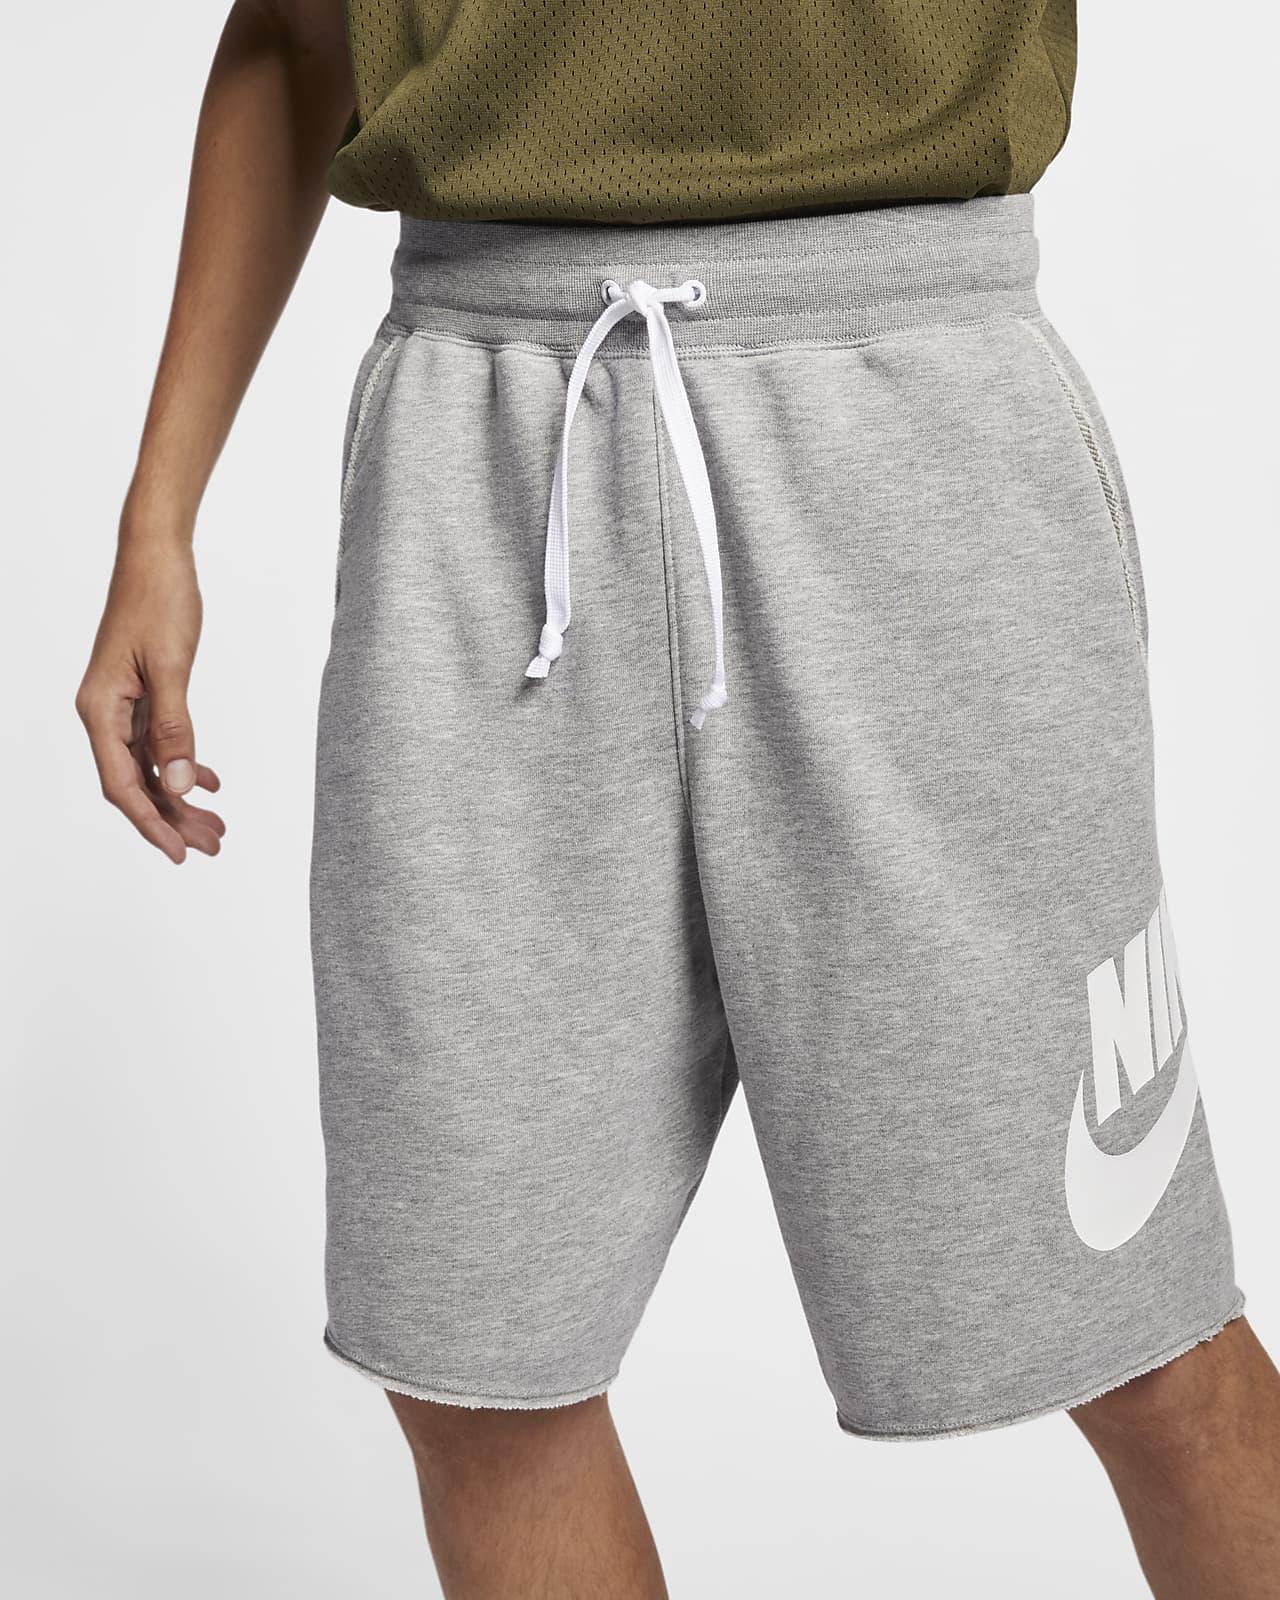 Shorts in French Terry Nike Sportswear Alumni - Uomo